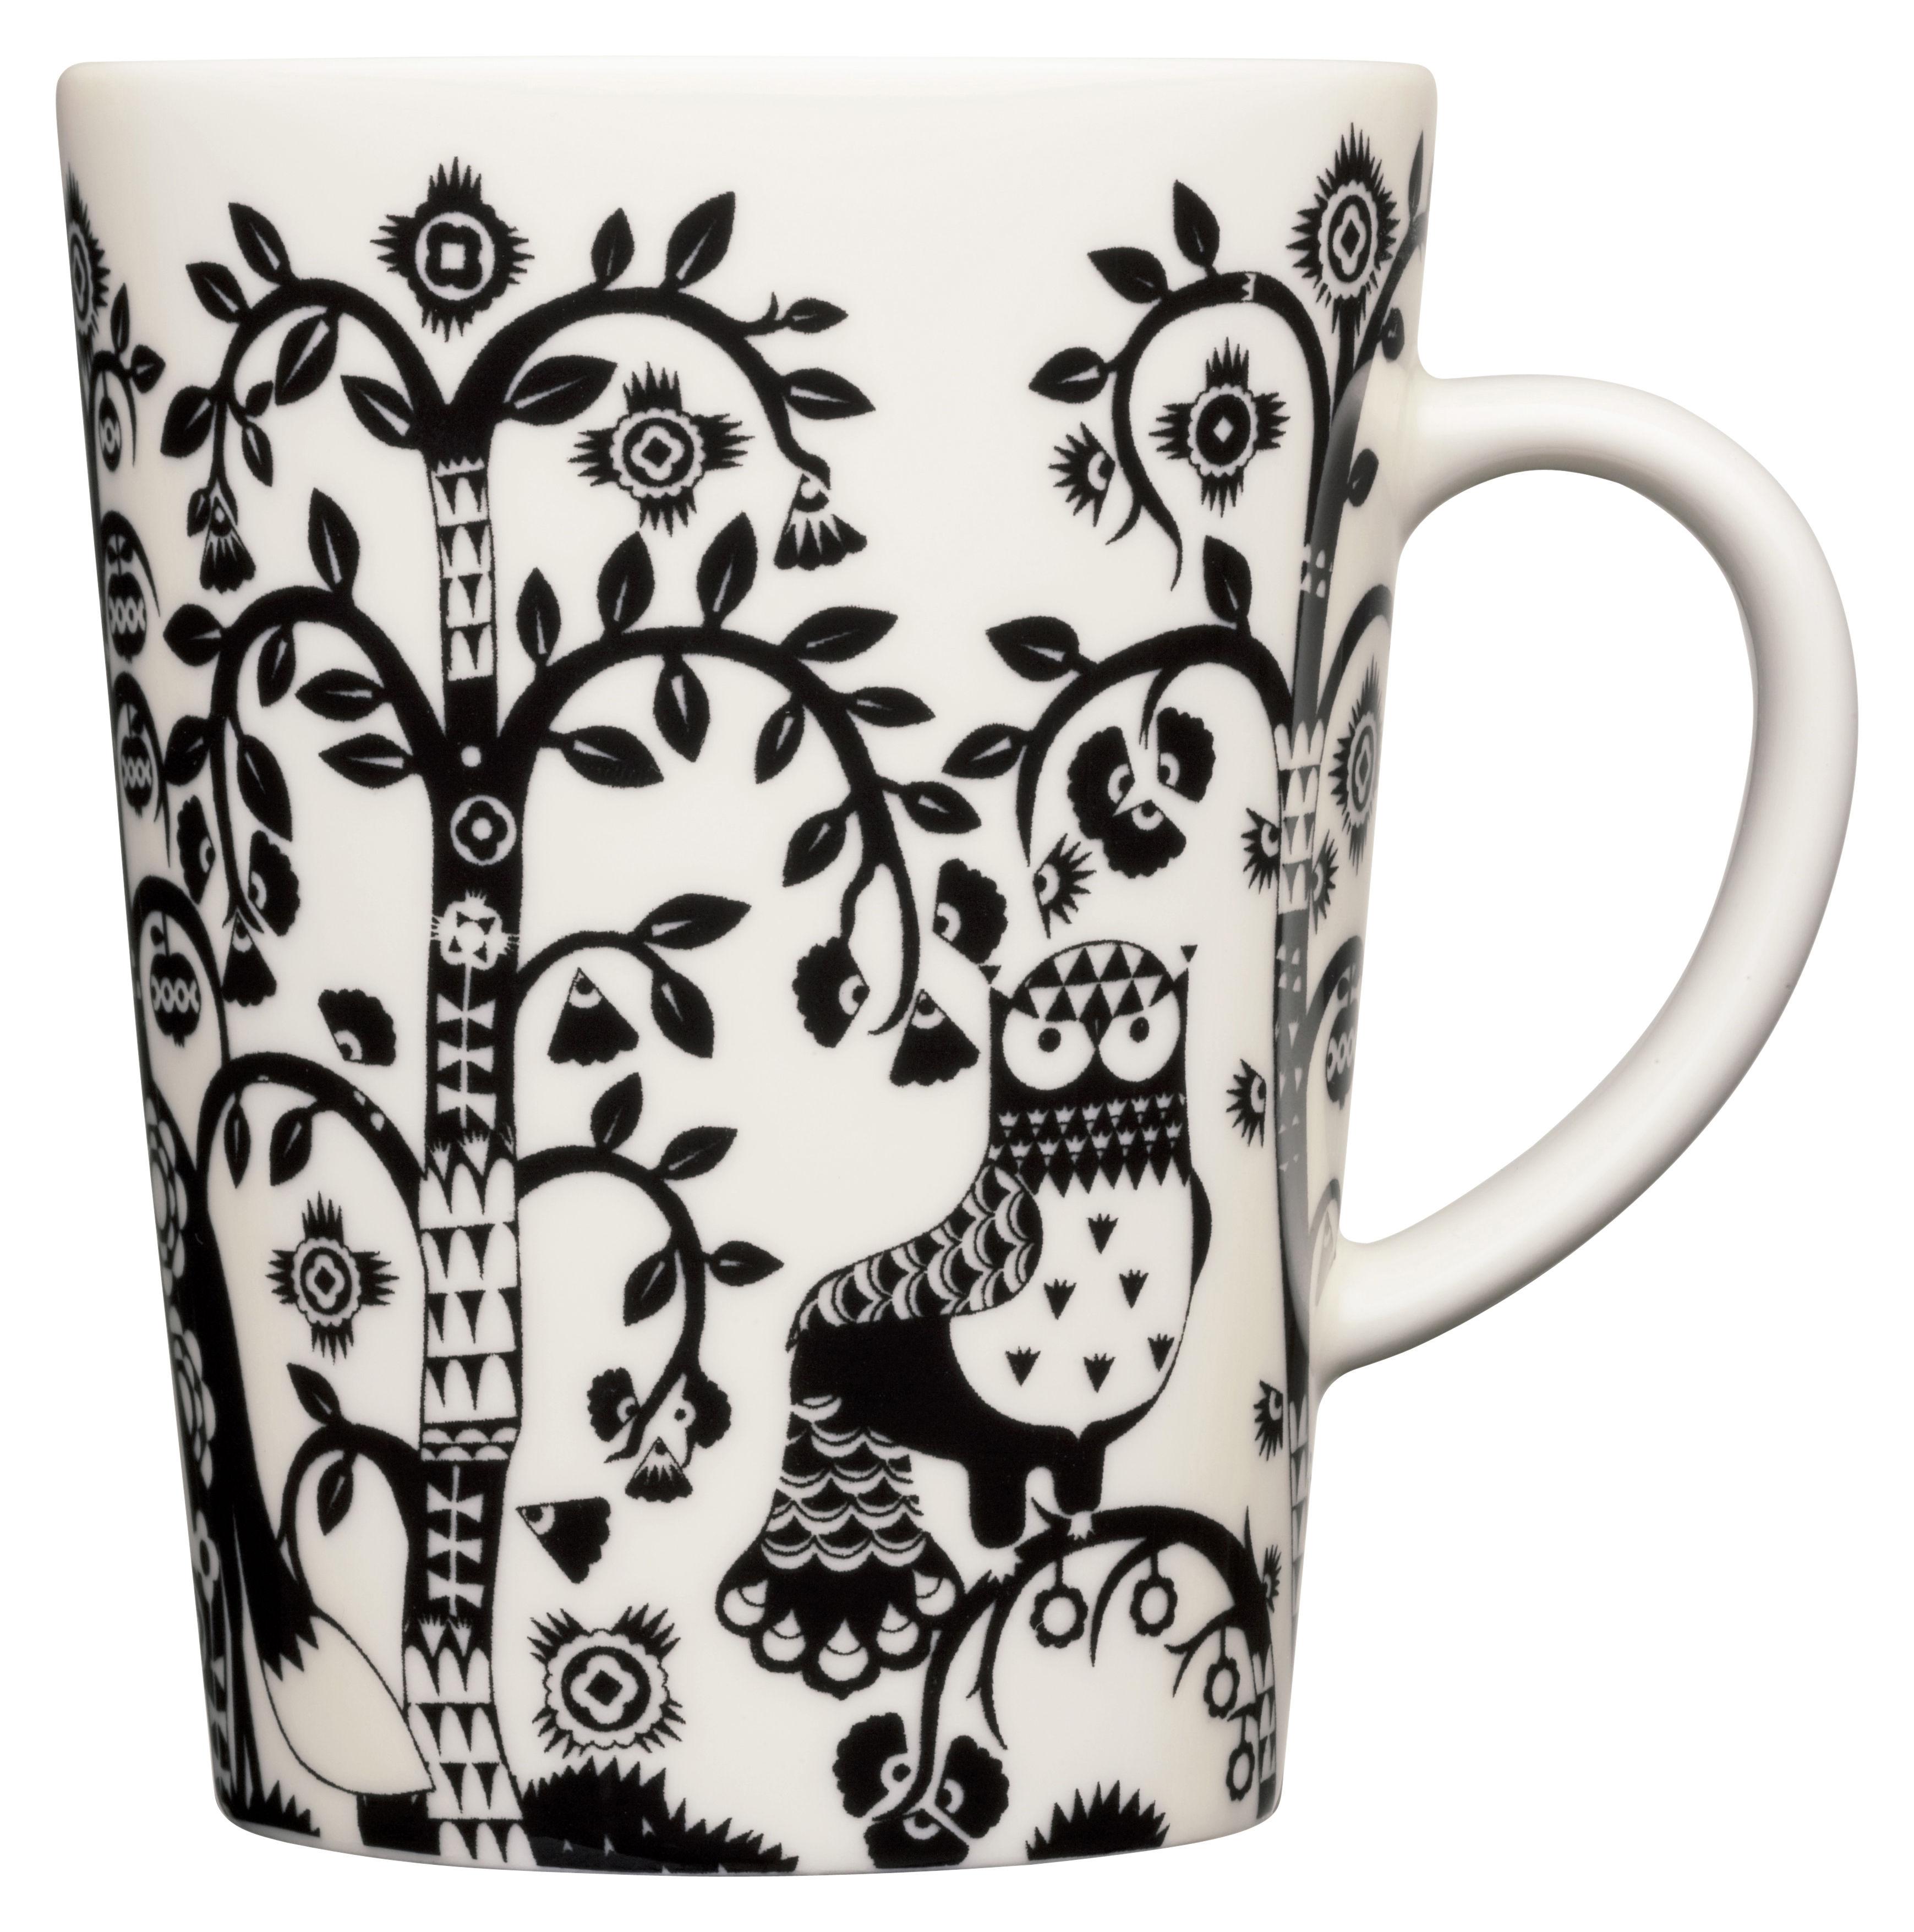 Tableware - Coffee Mugs & Tea Cups - Taika Mug by Iittala - Black - China